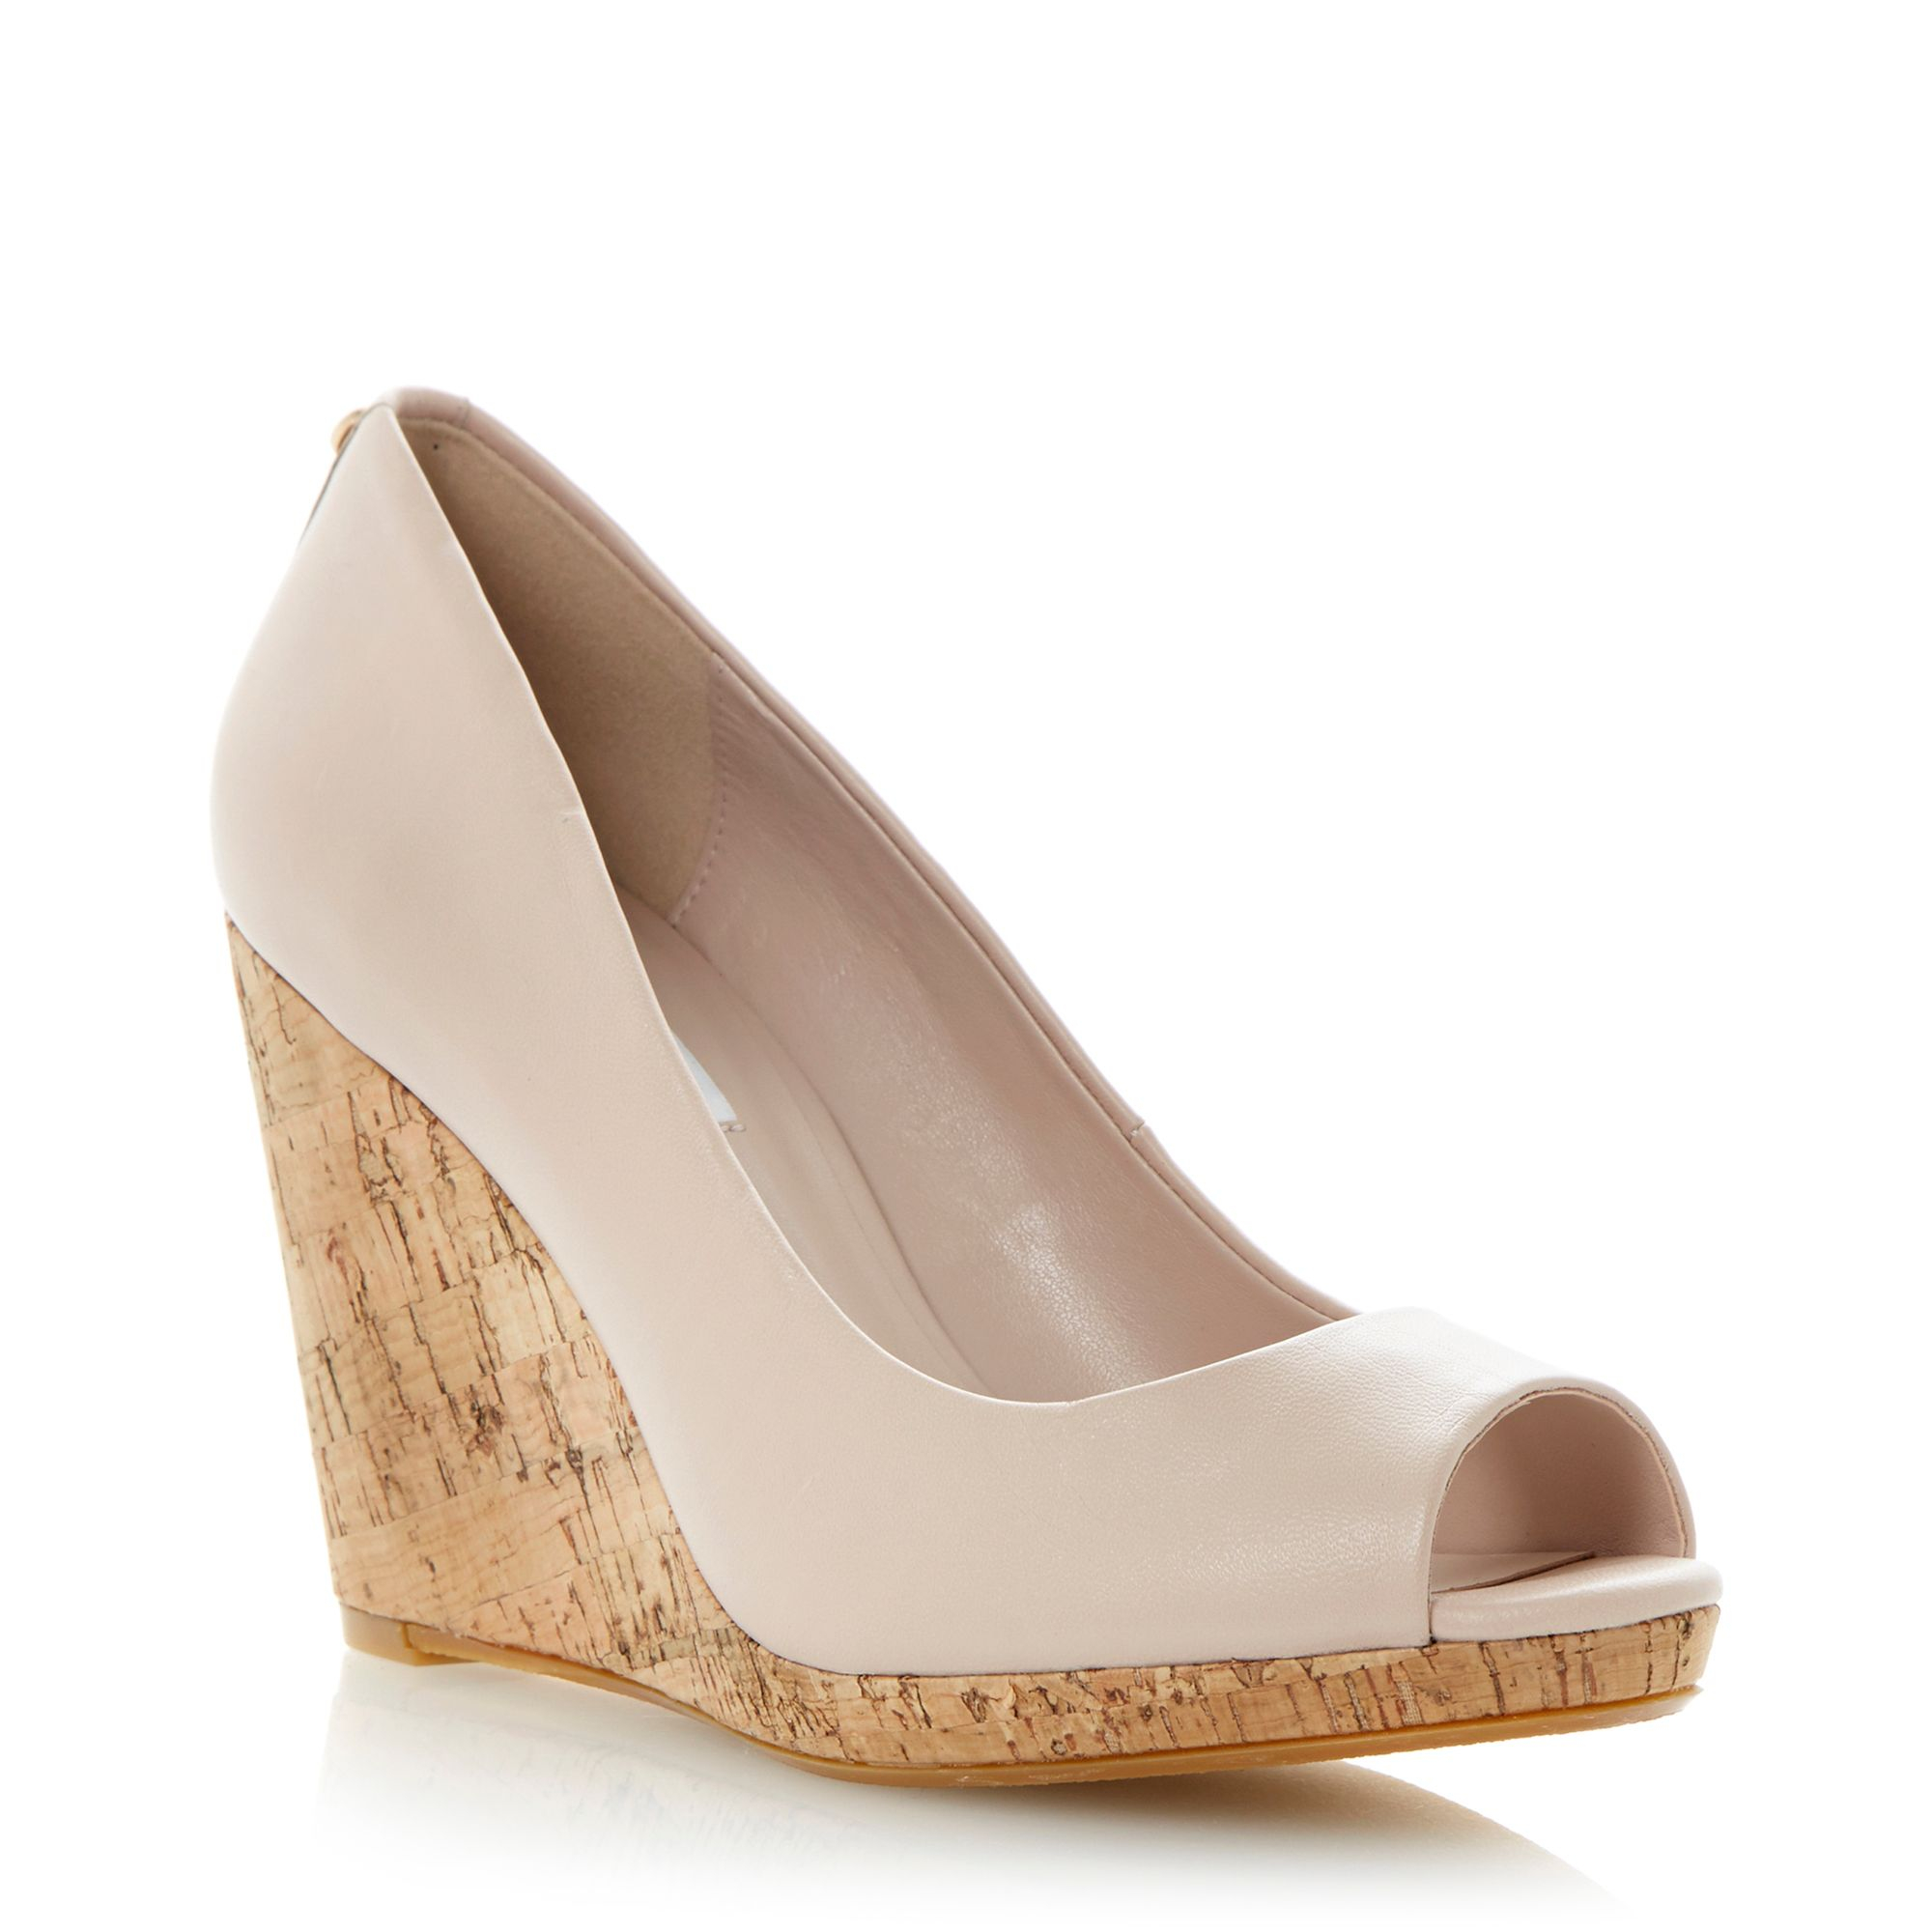 Kurt Geiger Peep Toe Shoes